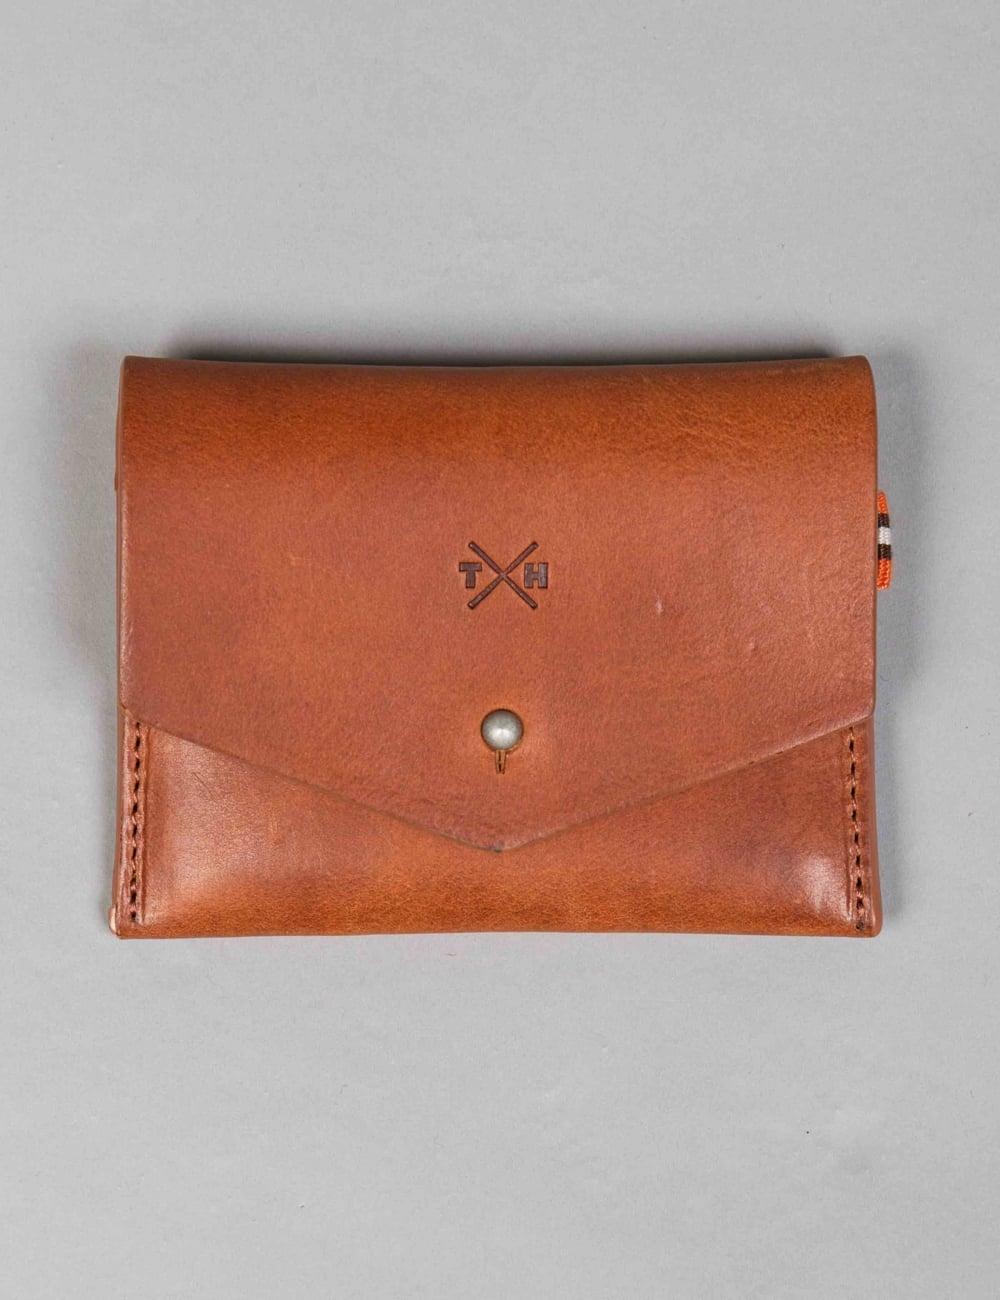 fashion style choose newest enjoy lowest price Chukka Leather Slim Wallet - Tan